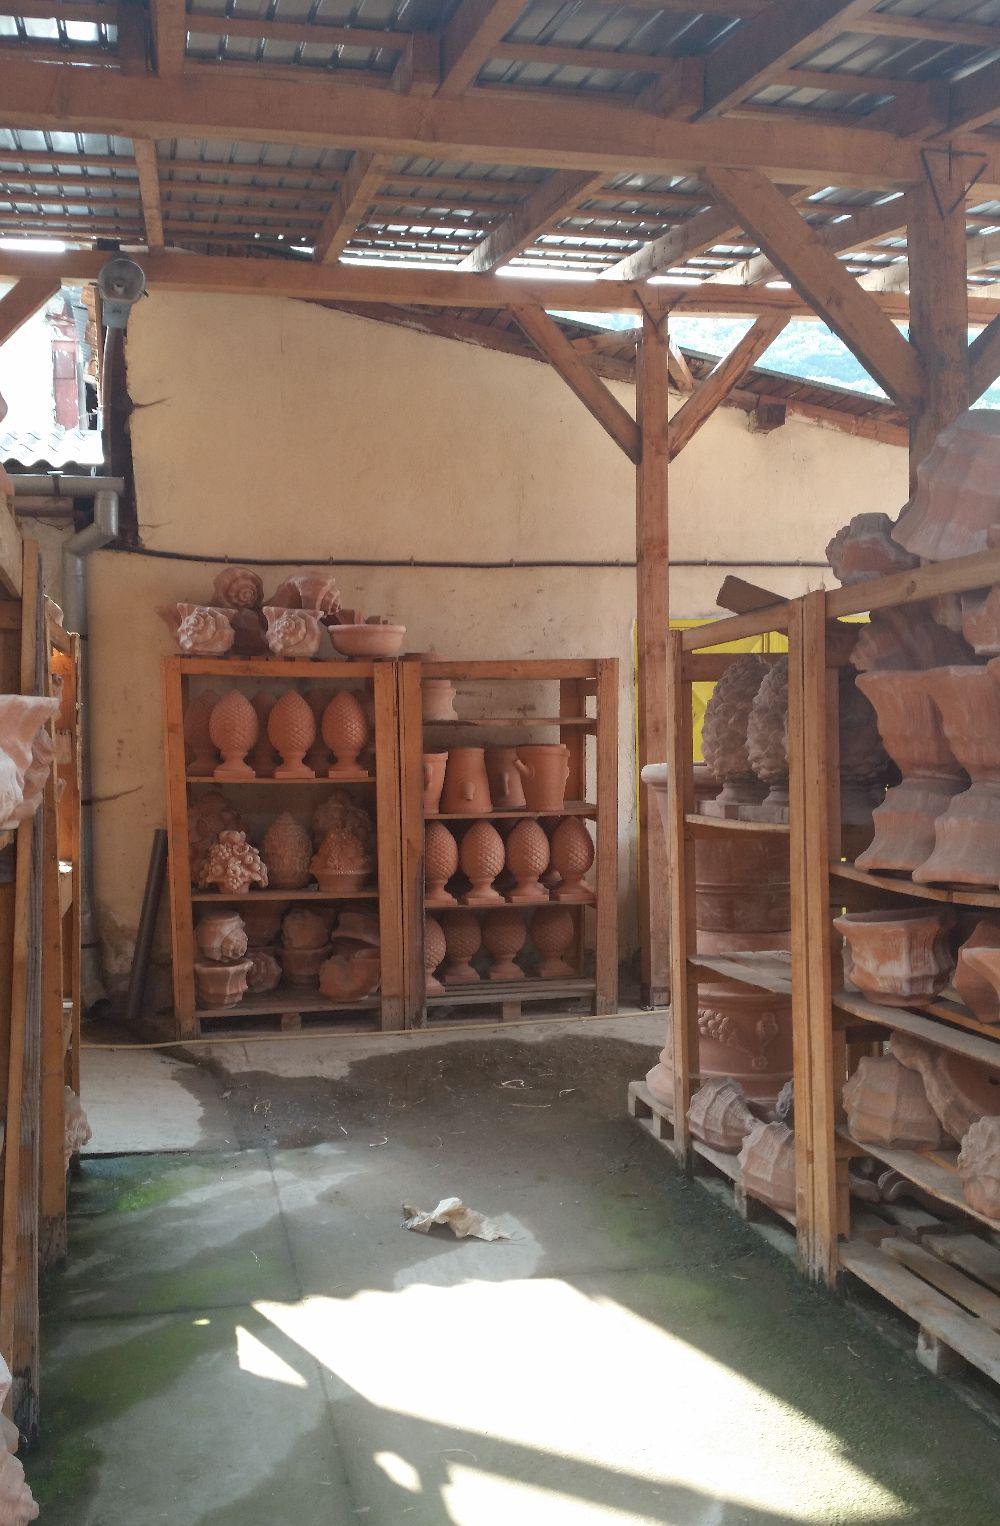 adelaparvu.com despre vase de gradina, ghivece si ornamente din teracota, lut, Terecote Sighisoara Romania (15)